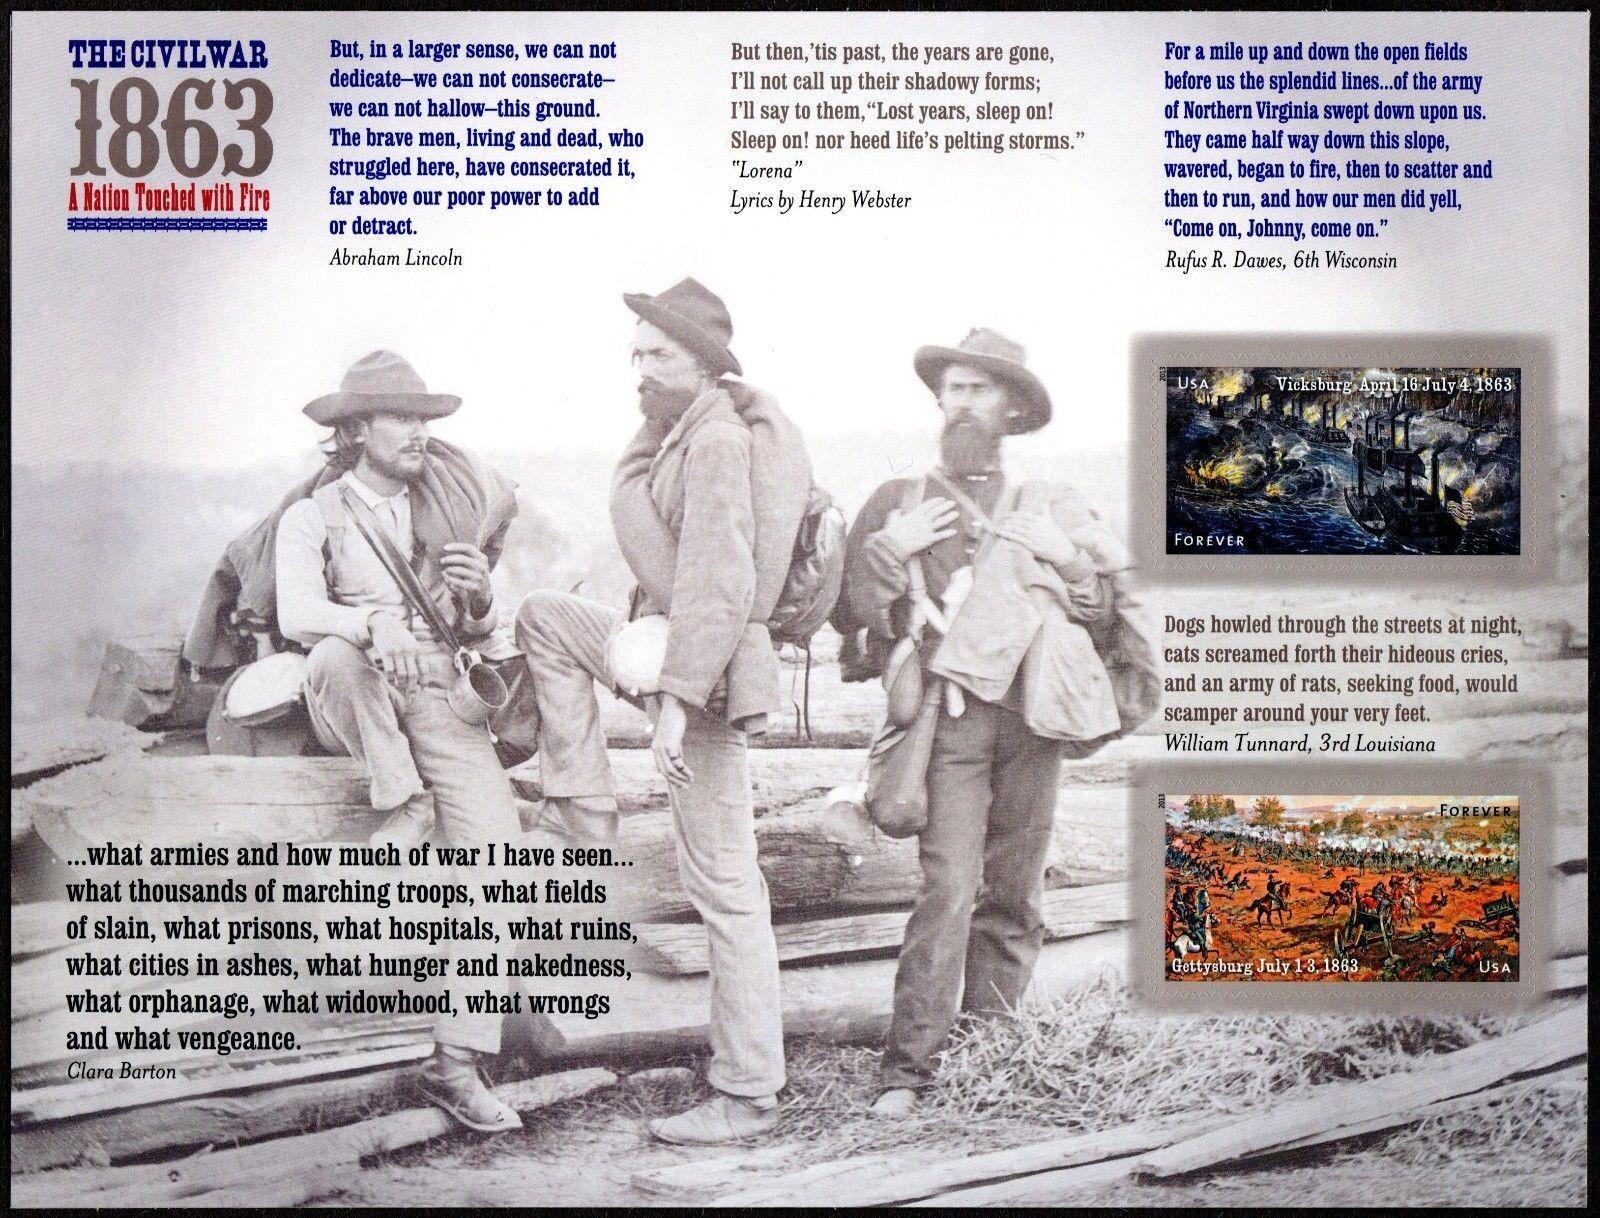 2013 46c Civil War 1863 Vicksburg & Gettysburg Scott 47